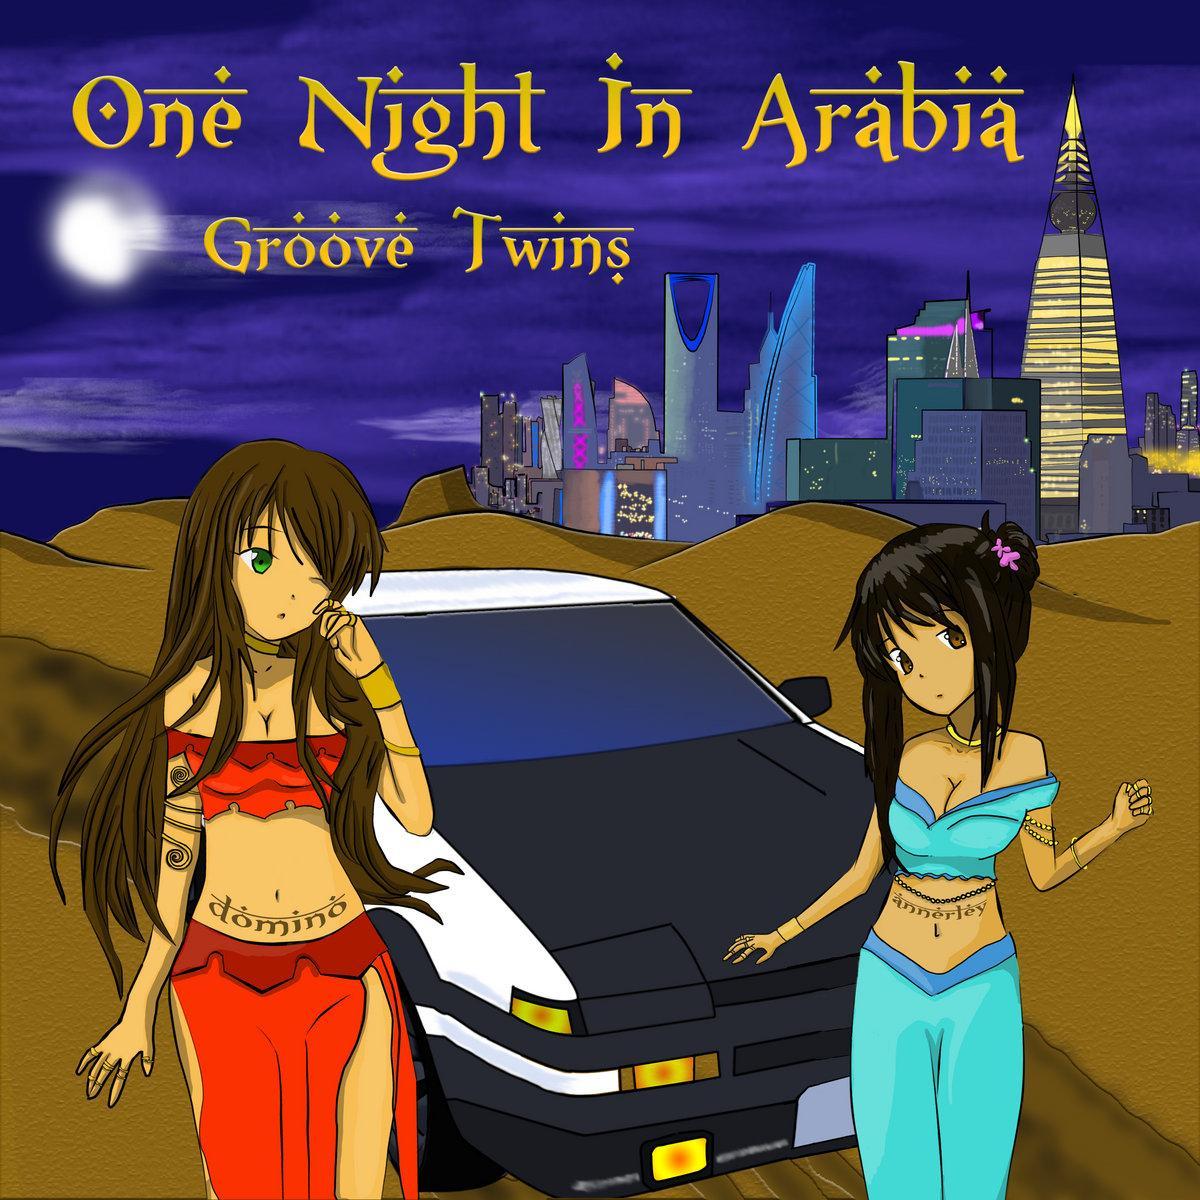 Groove Twins - One Night In Arabia (Ann Lee und Domino)